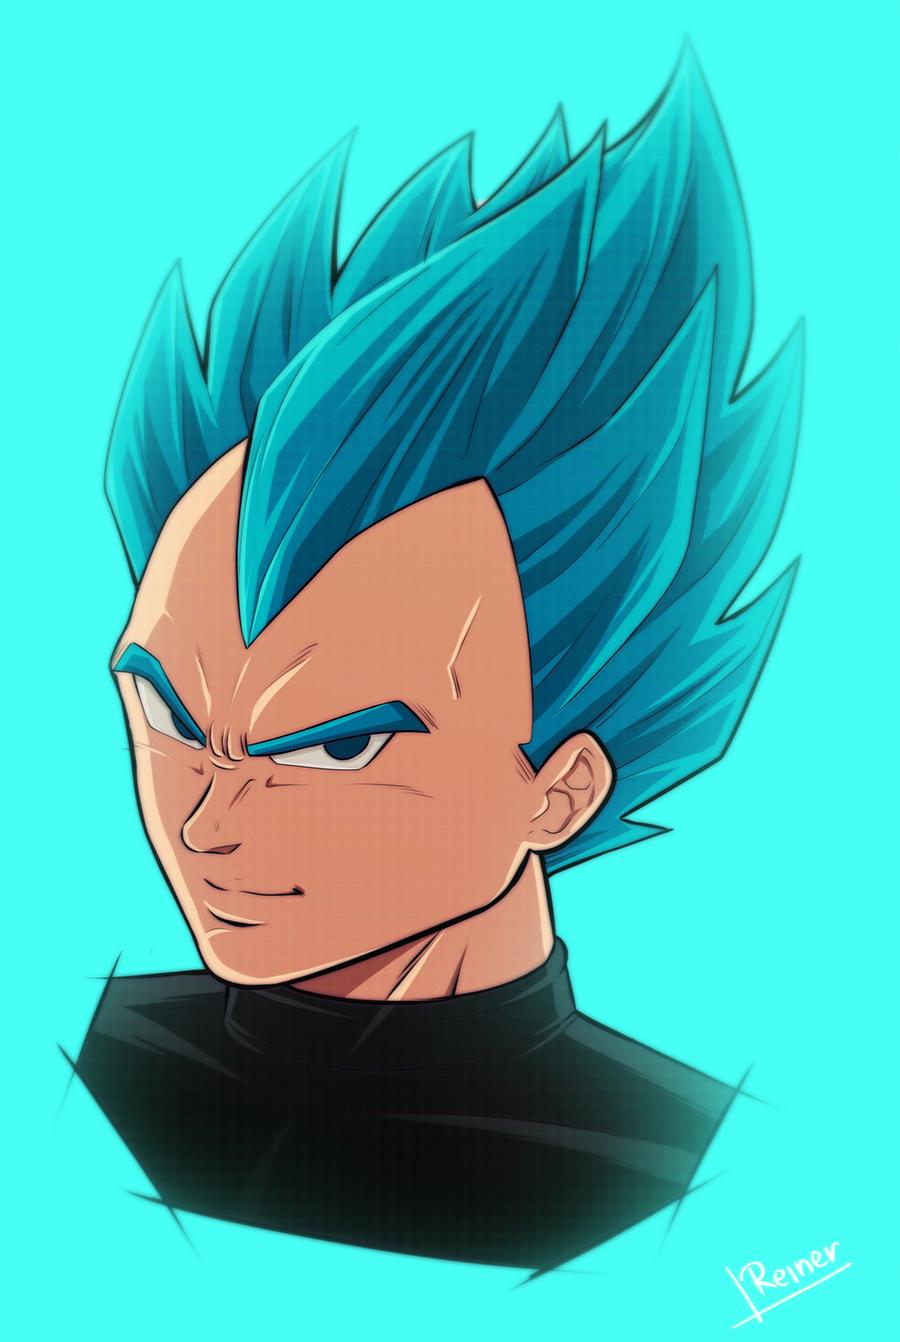 The blue god!